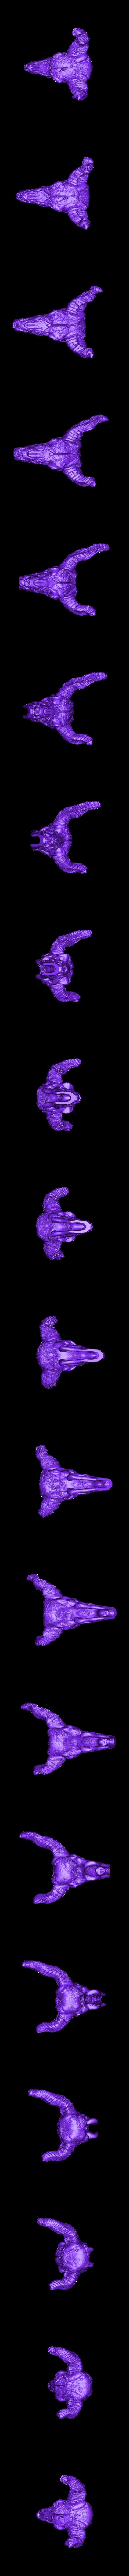 Crown_Skull.stl Download free STL file Storied Skulls Crown and Tiara • 3D printer model, alterboy987